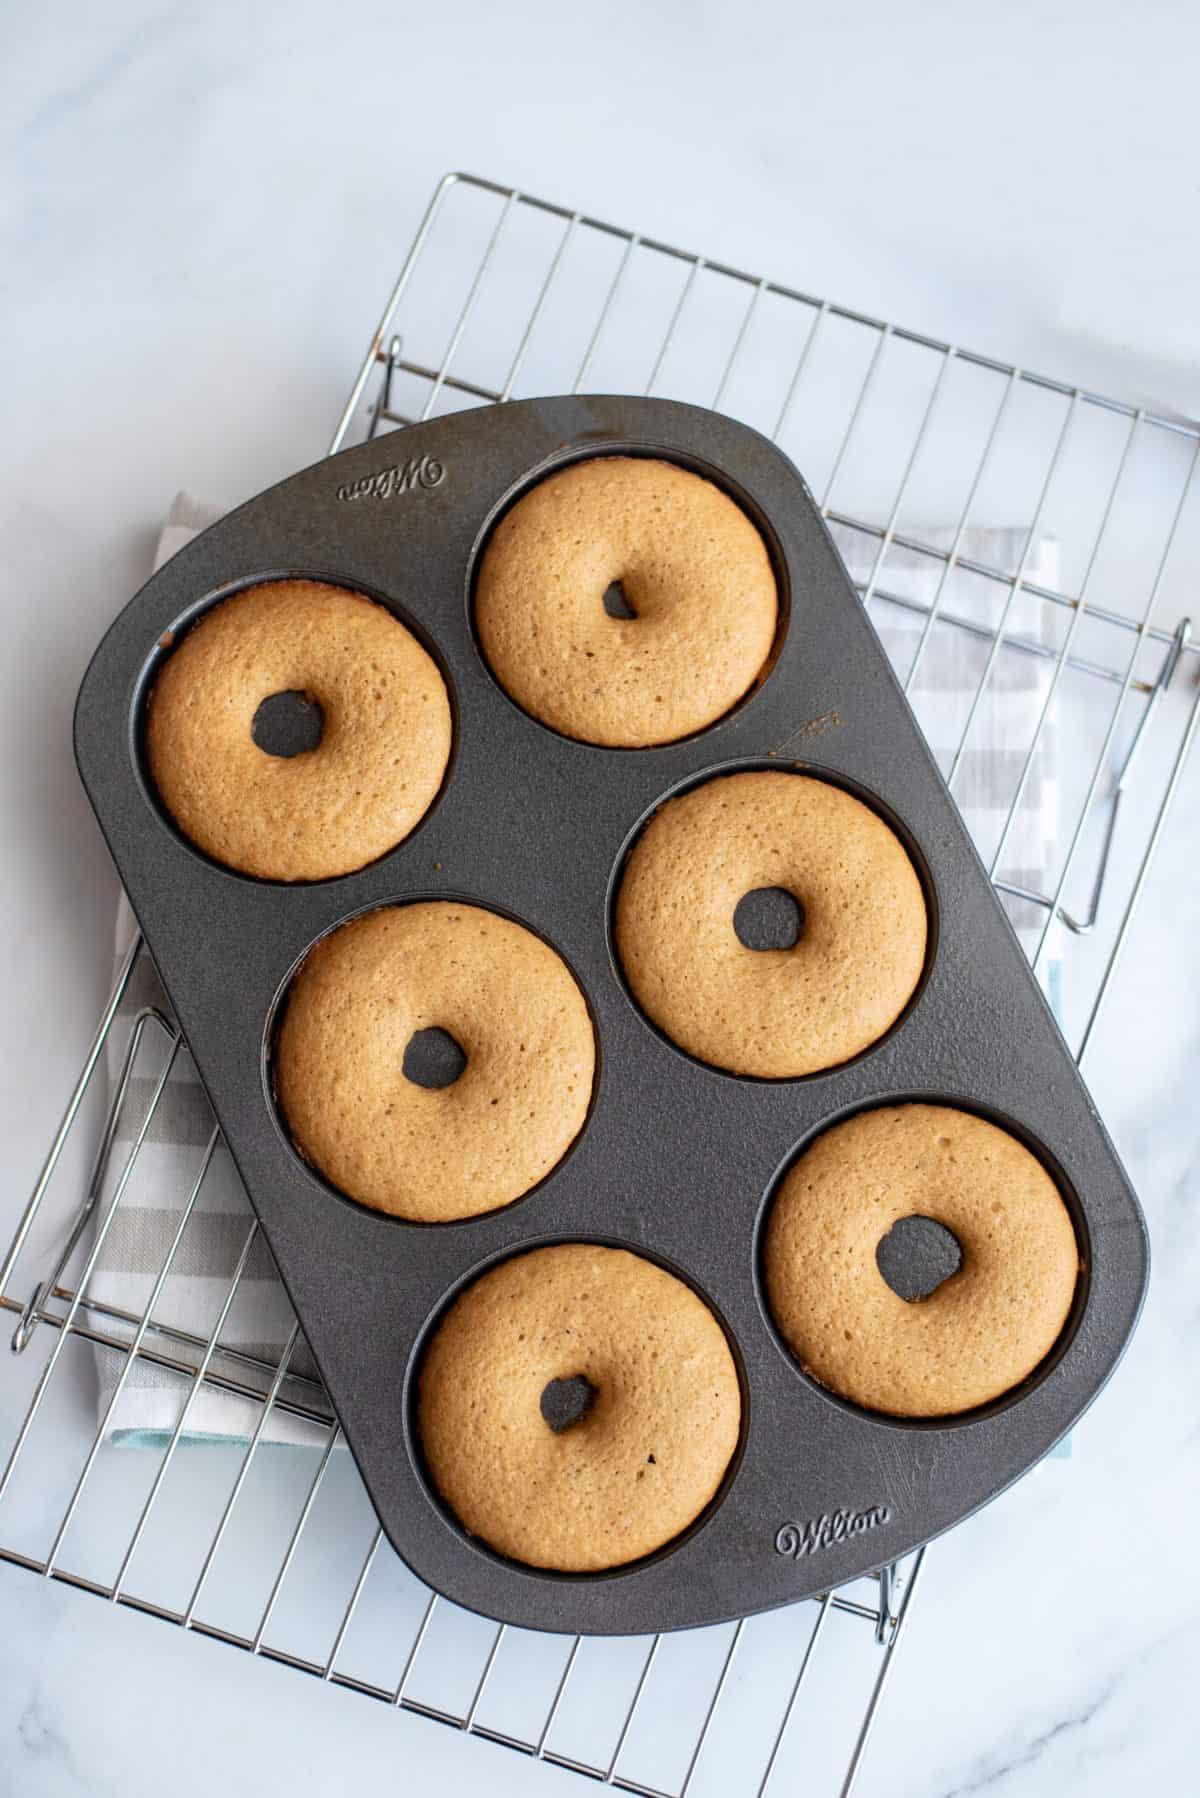 Donut tray of baked donuts.